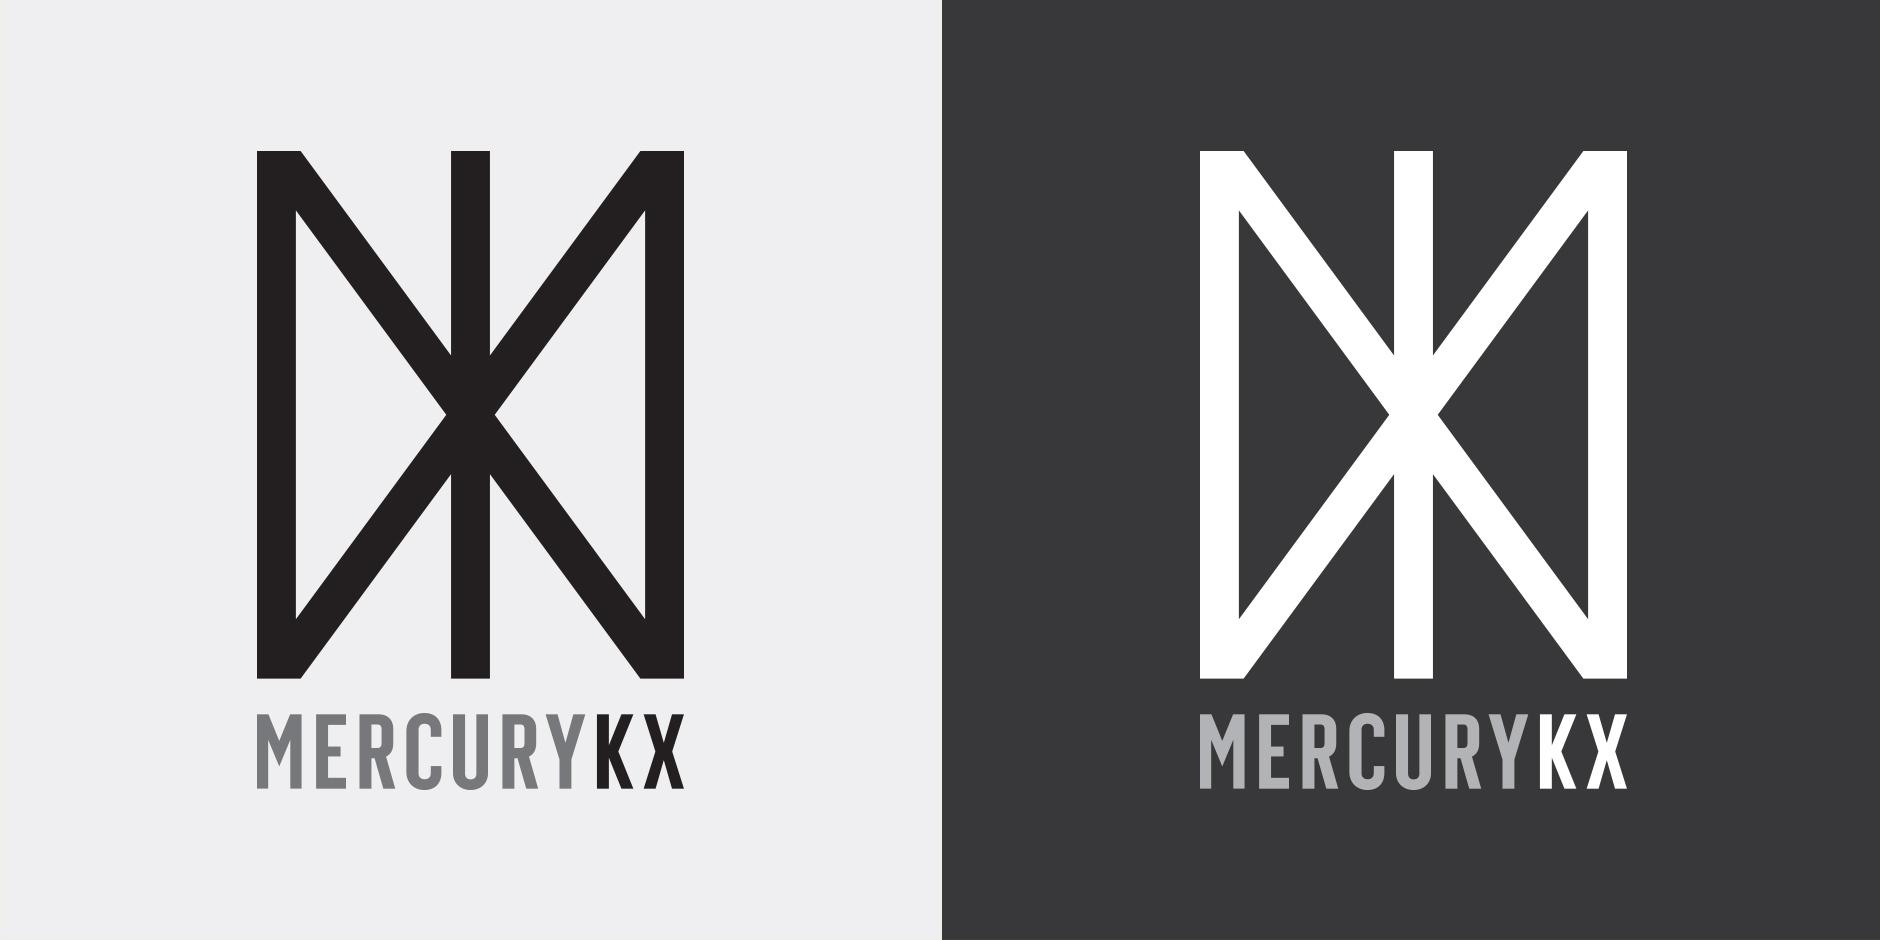 Mercury_KX